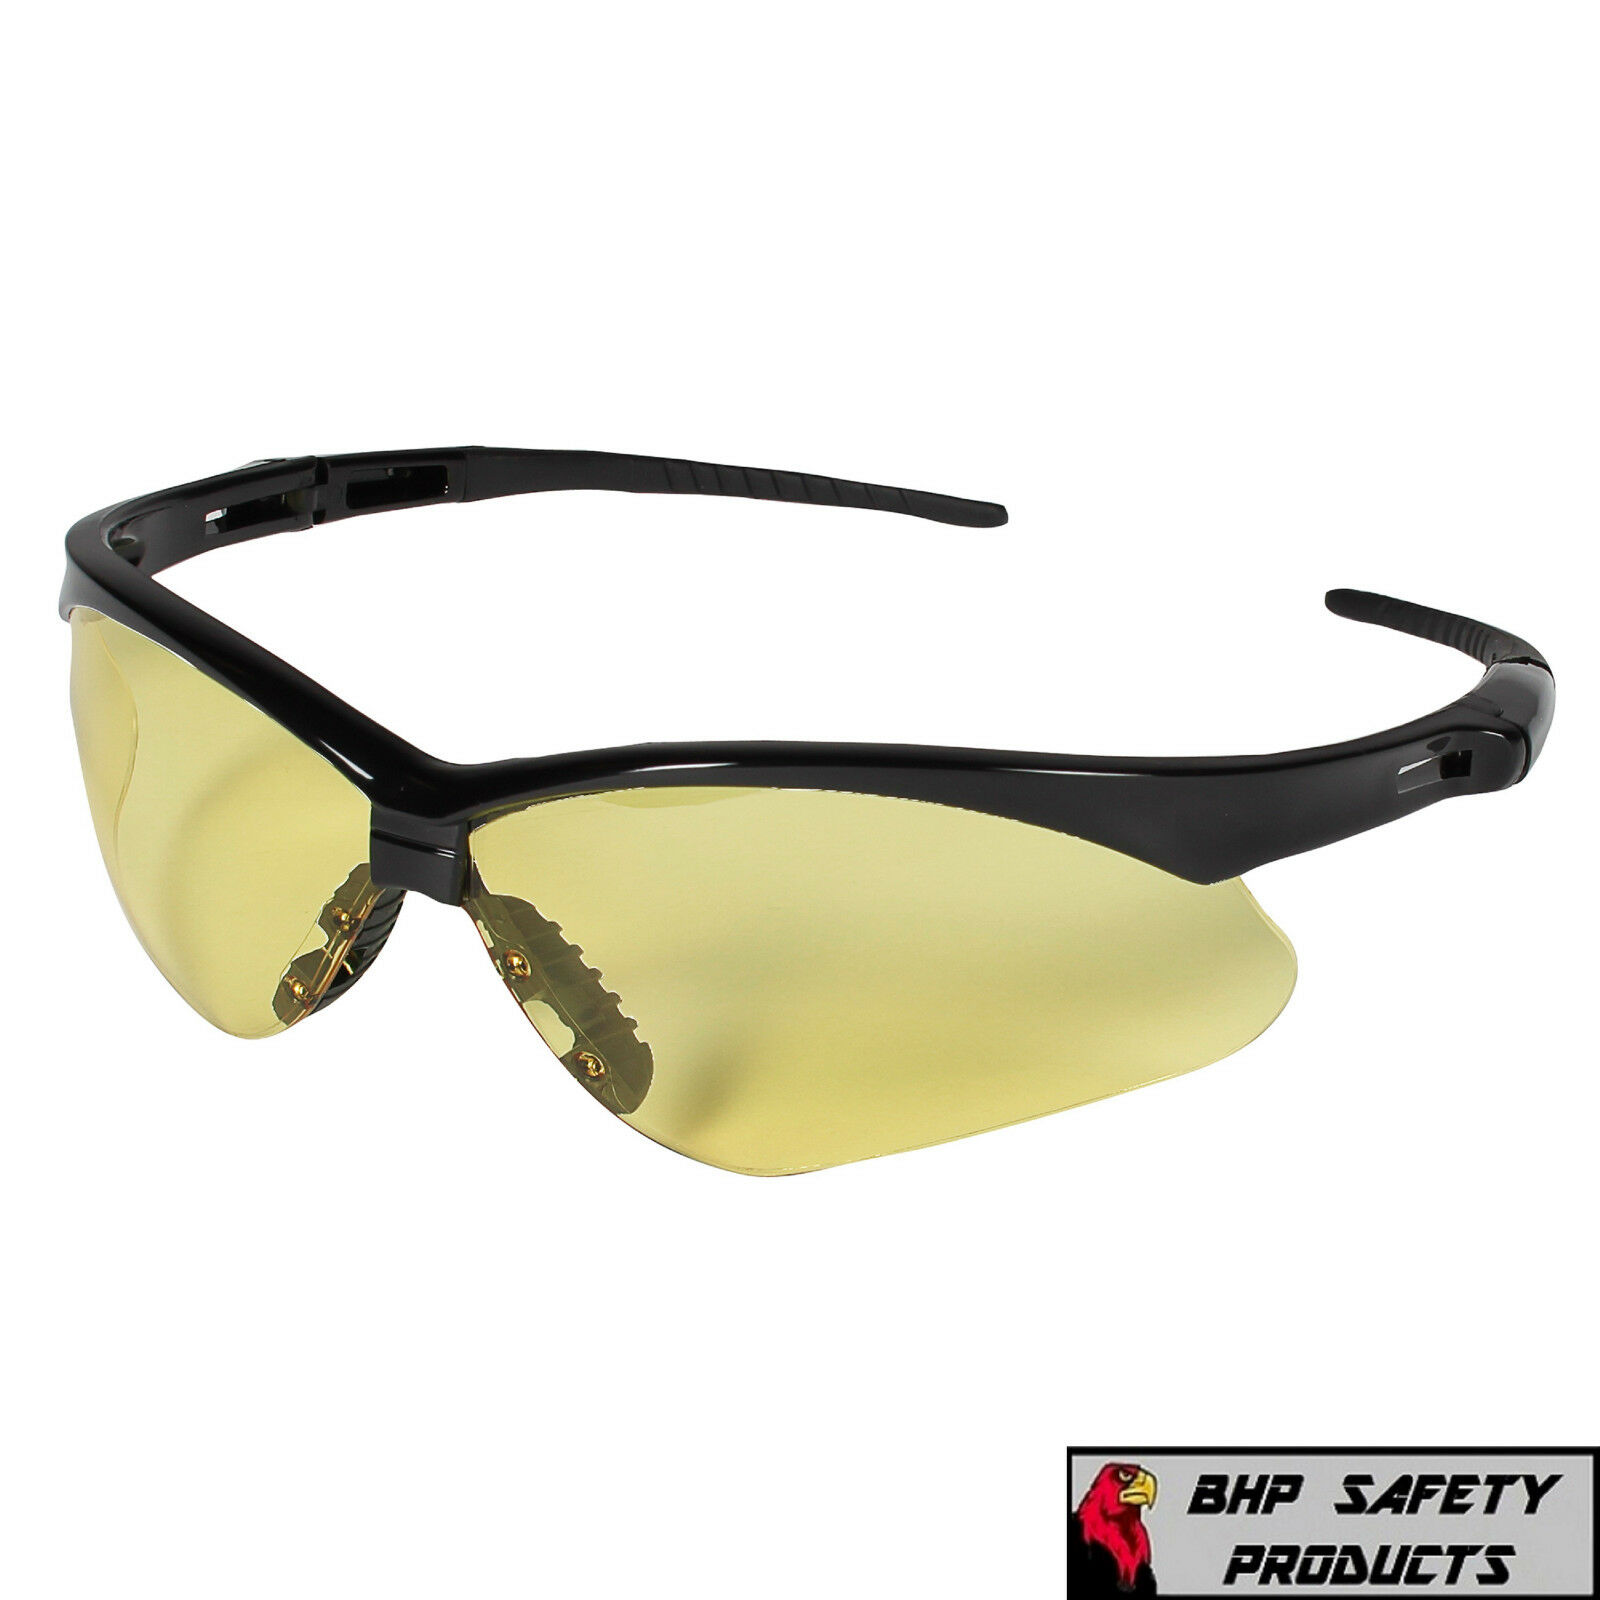 JACKSON NEMESIS SAFETY GLASSES SUNGLASSES SPORT WORK EYEWEAR ANSI Z87 COMPLIANT 25659- Black Frame/Amber Lens